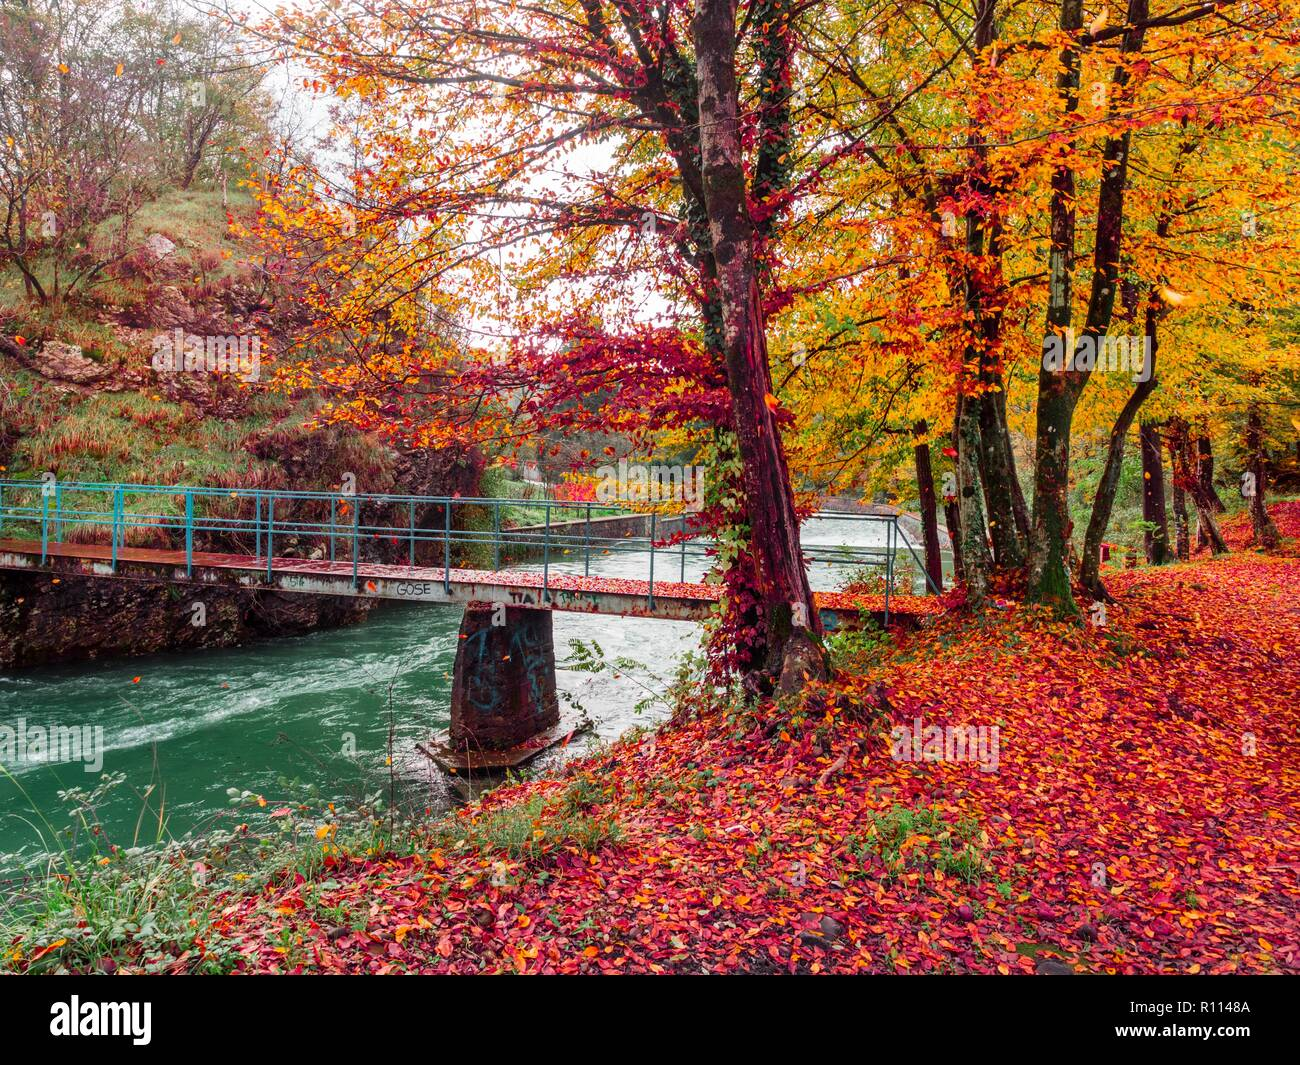 Stunning Red Autumn Fall nature scenery flowing river small bridge falling leaves from numerous tree along riverline Lukezi near Rijeka in Croatia - Stock Image